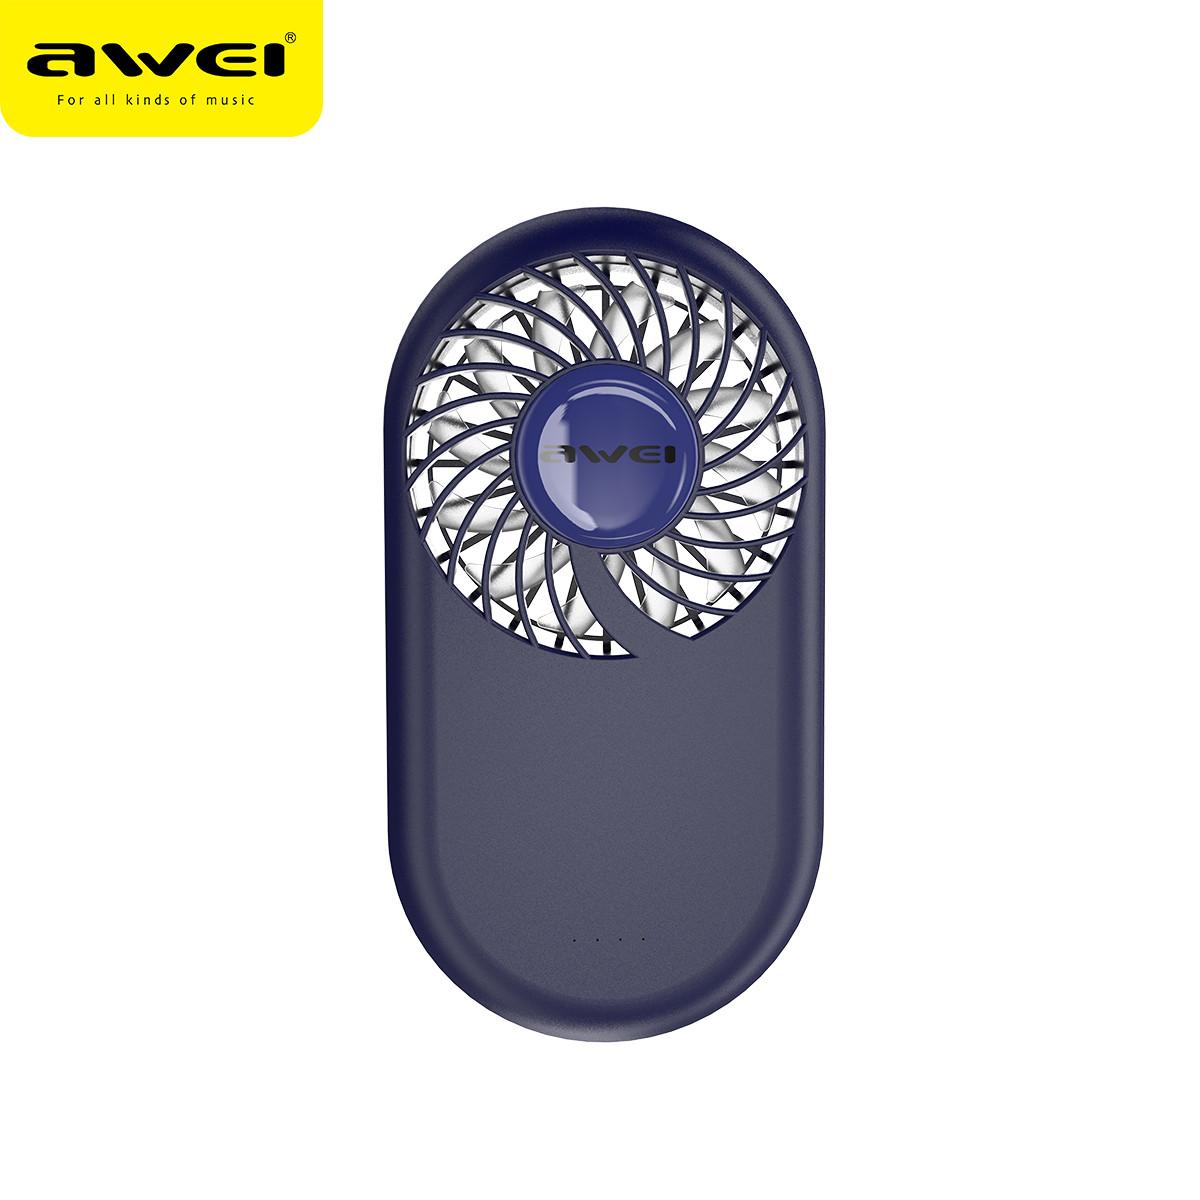 Портативный мини-вентилятор Awei F3 Mini Slim. Ручной вентилятор с аккумулятором Awei F3 Mini Slim